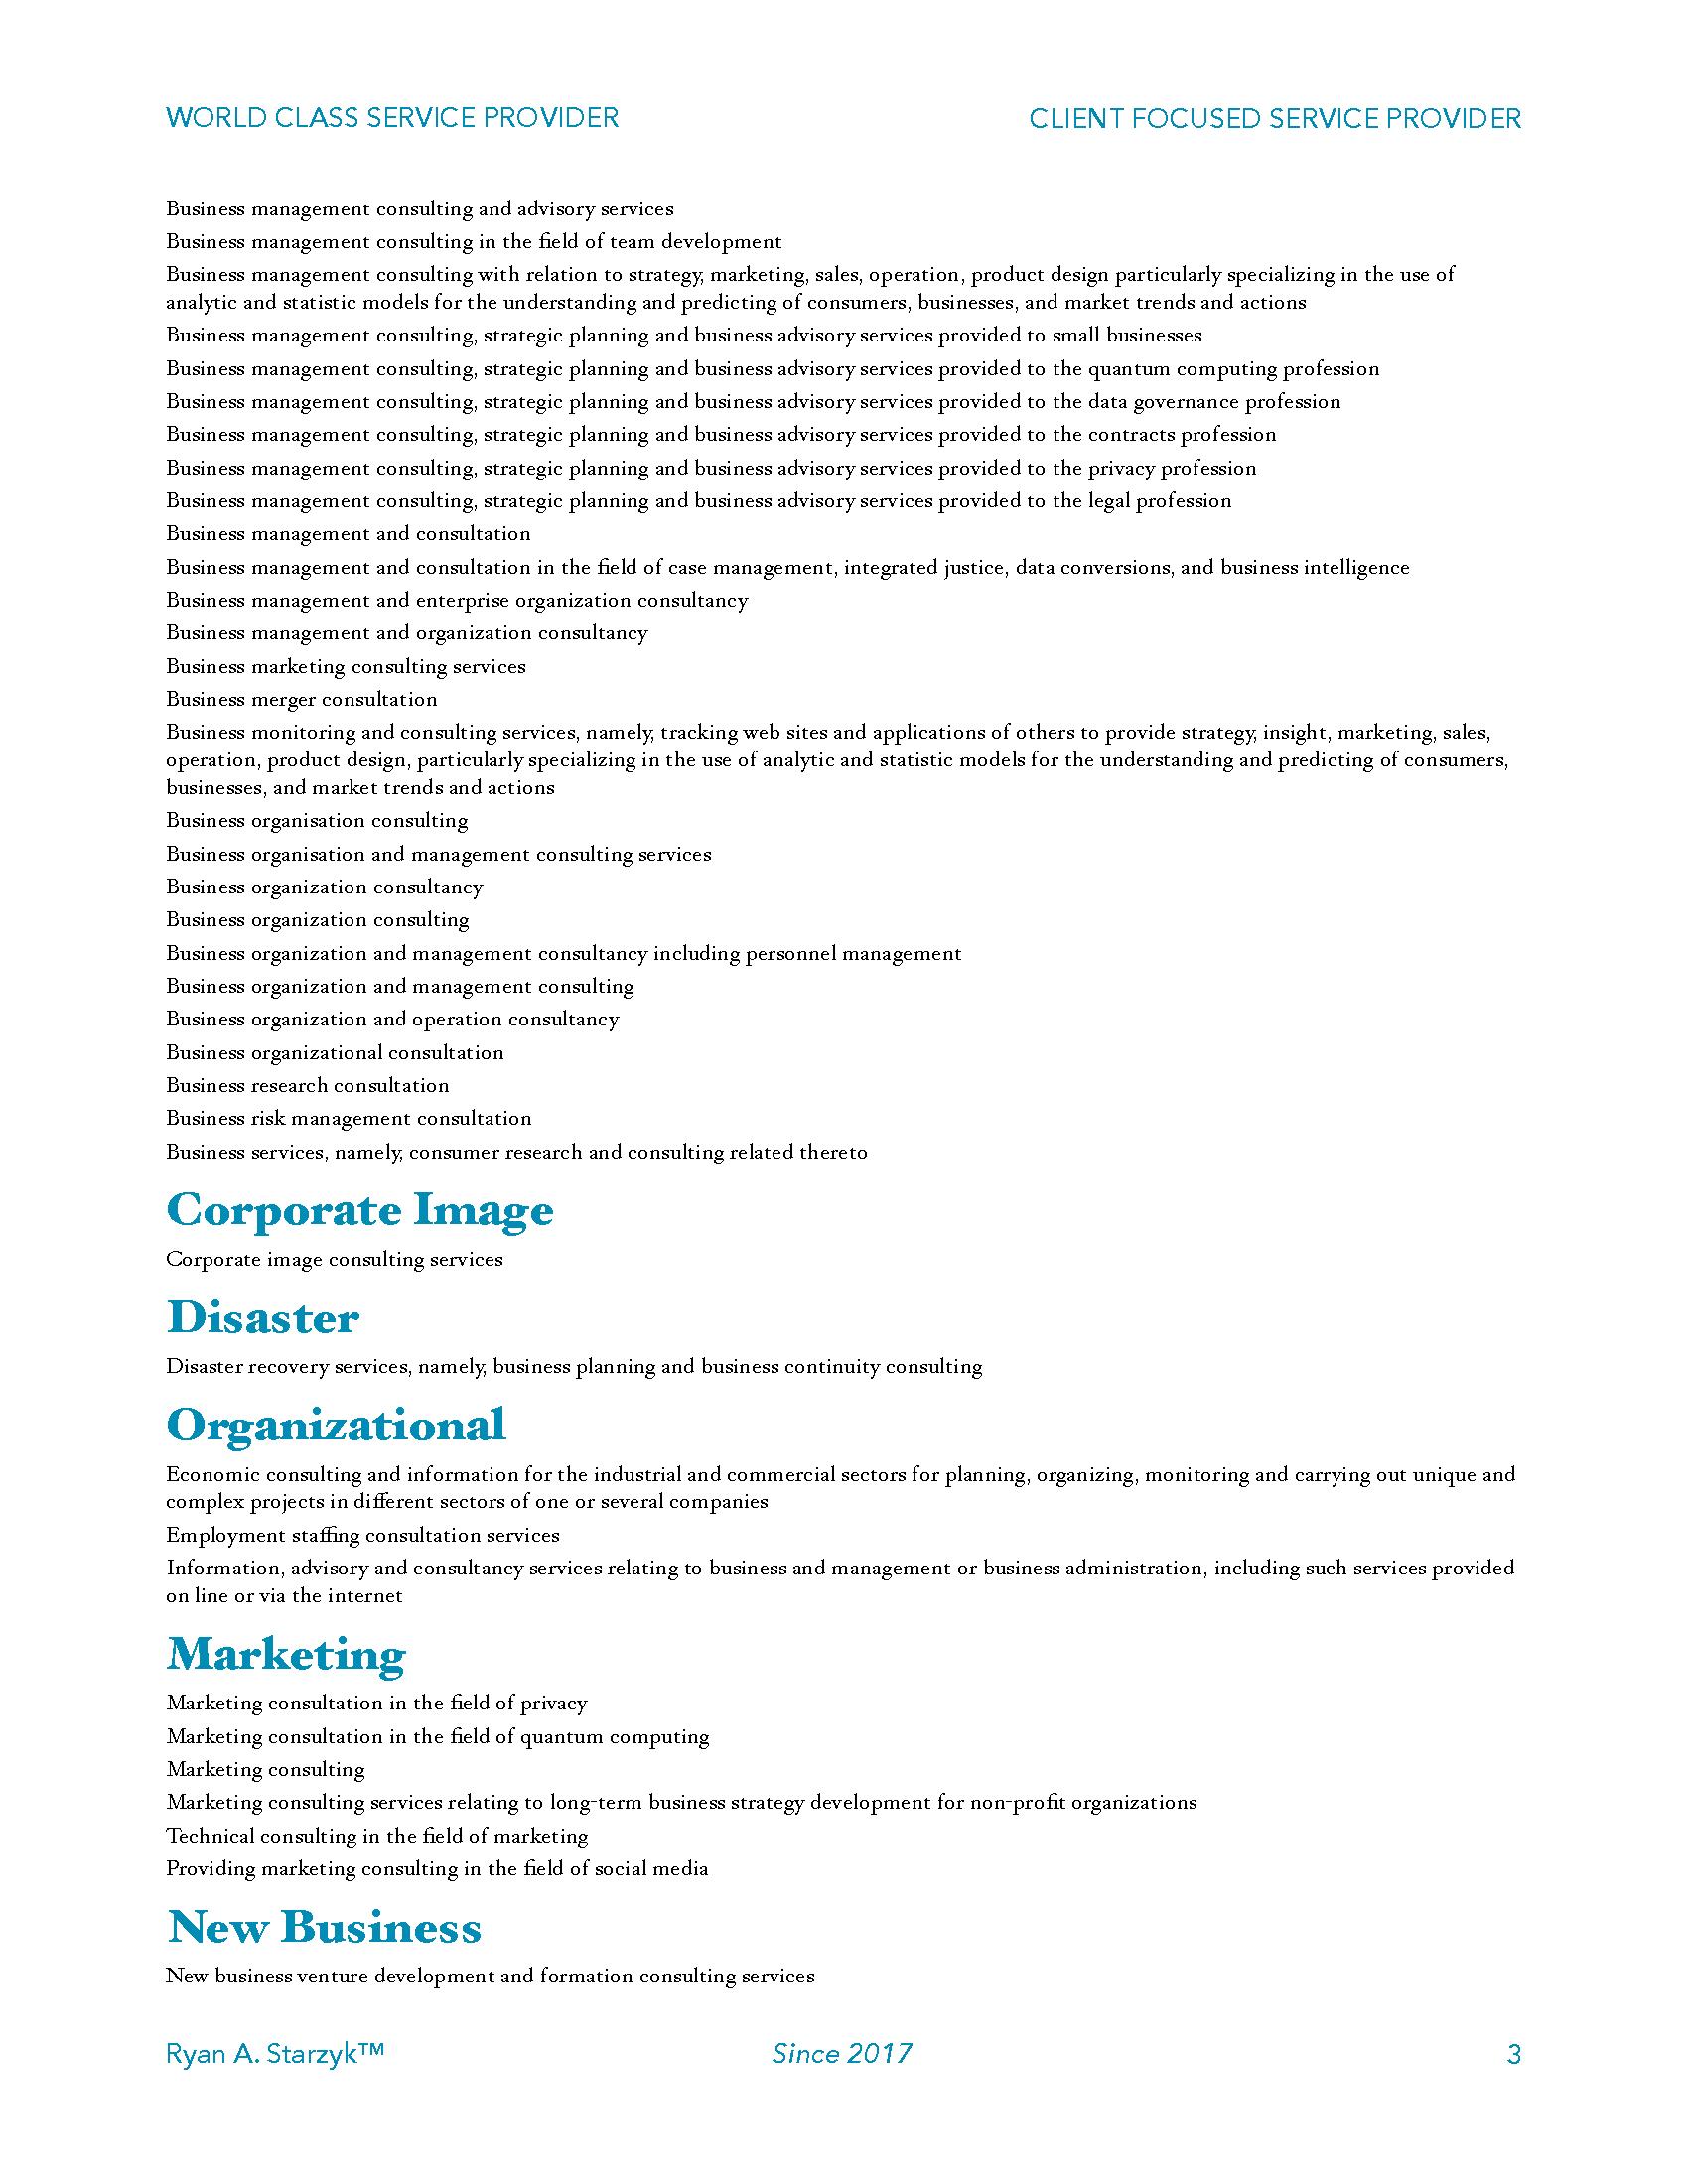 USPTO-RAS-July 2019_Page_3.png